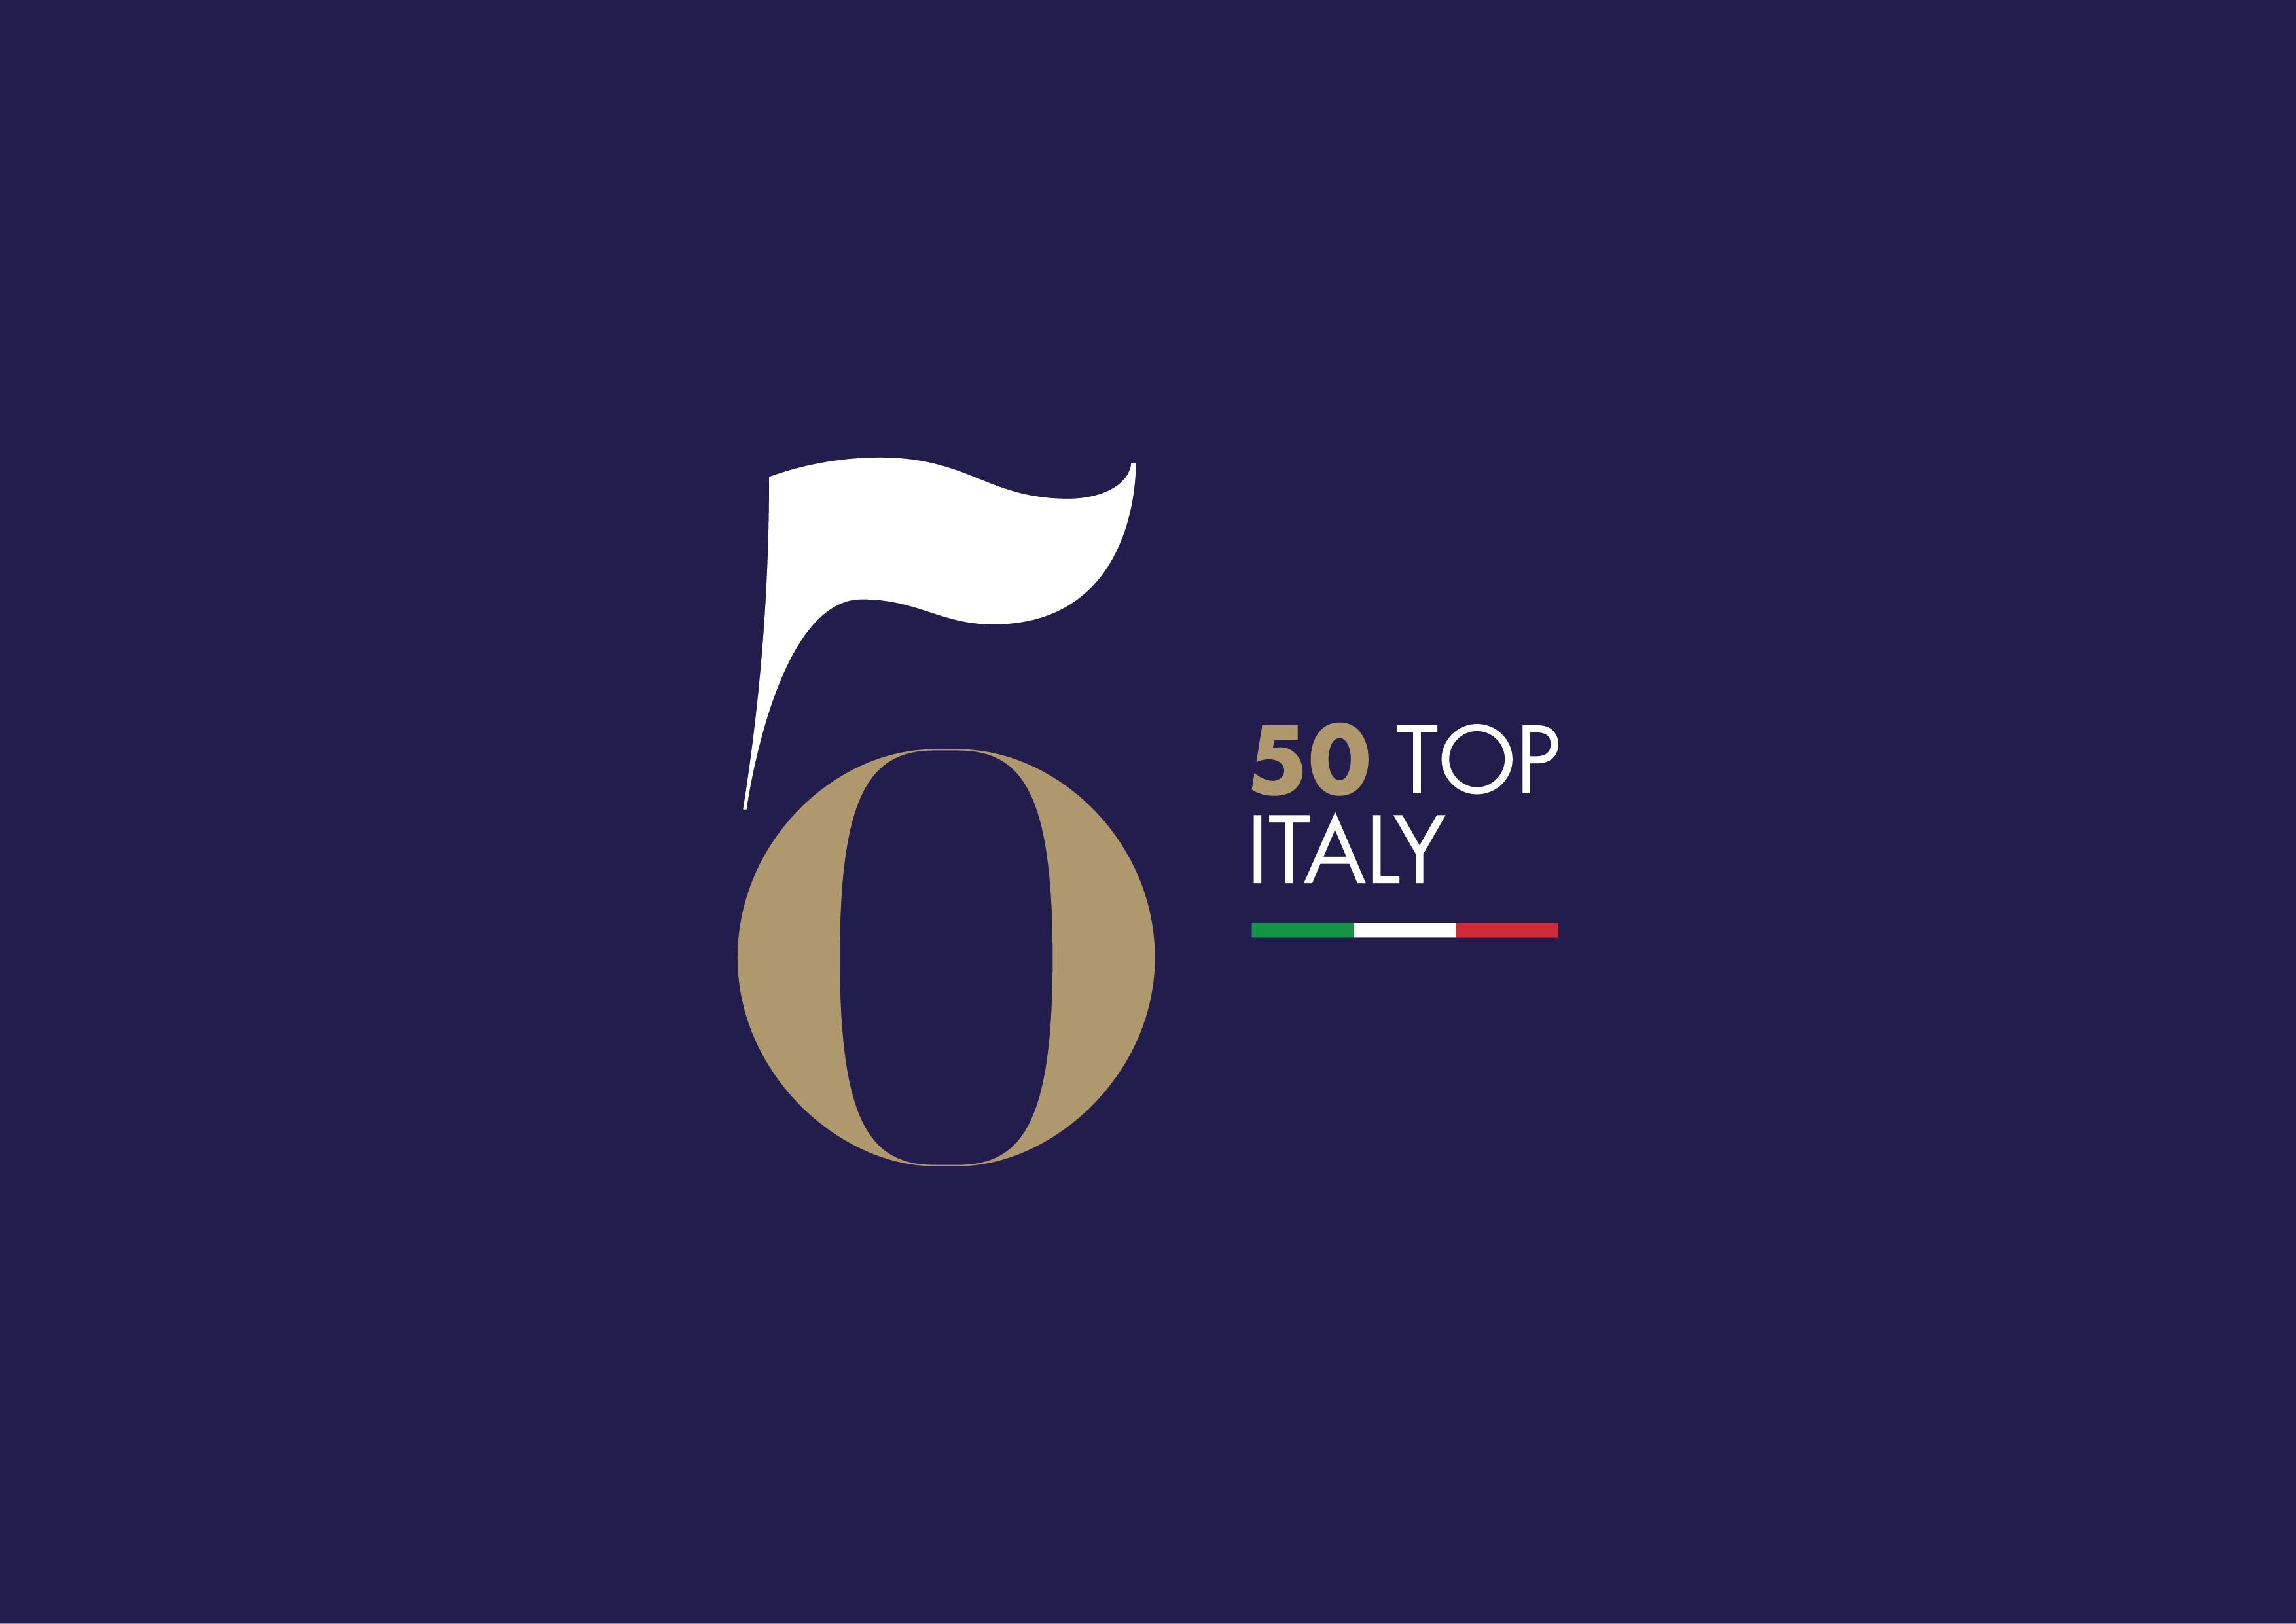 50 Top Italy - il nuovo logo